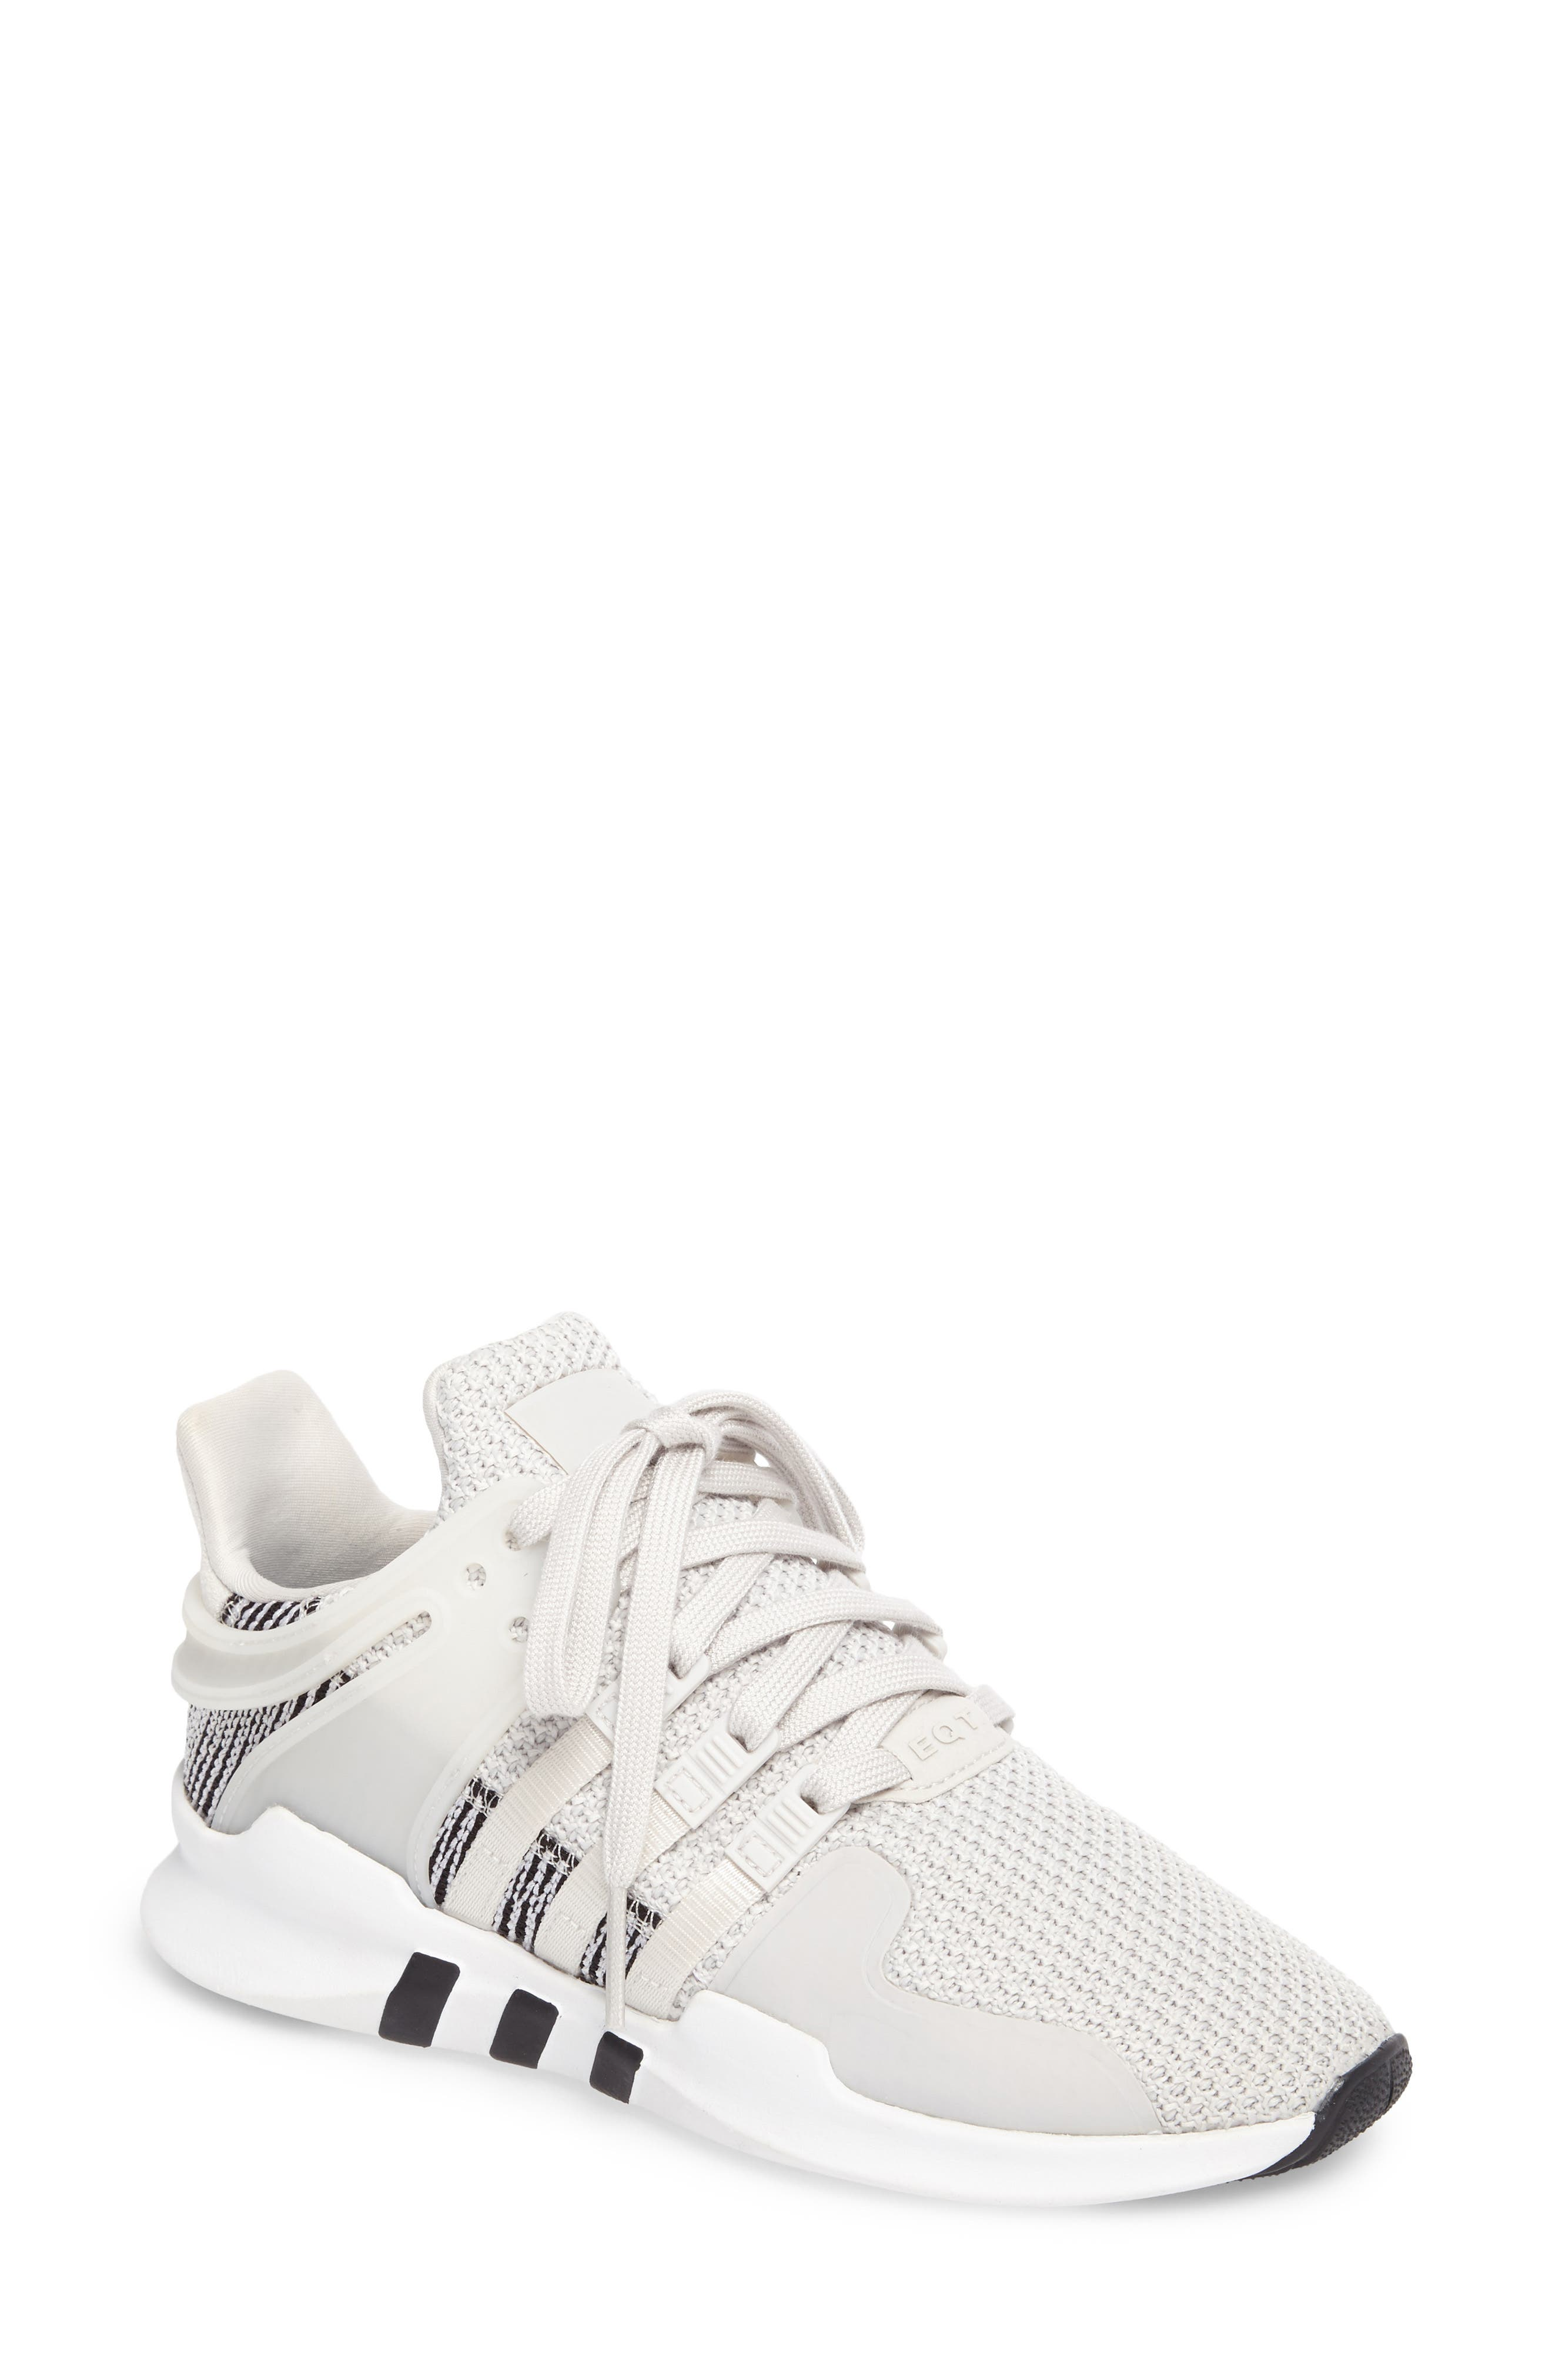 Main Image - adidas EQT Support Adv Sneaker (Women)